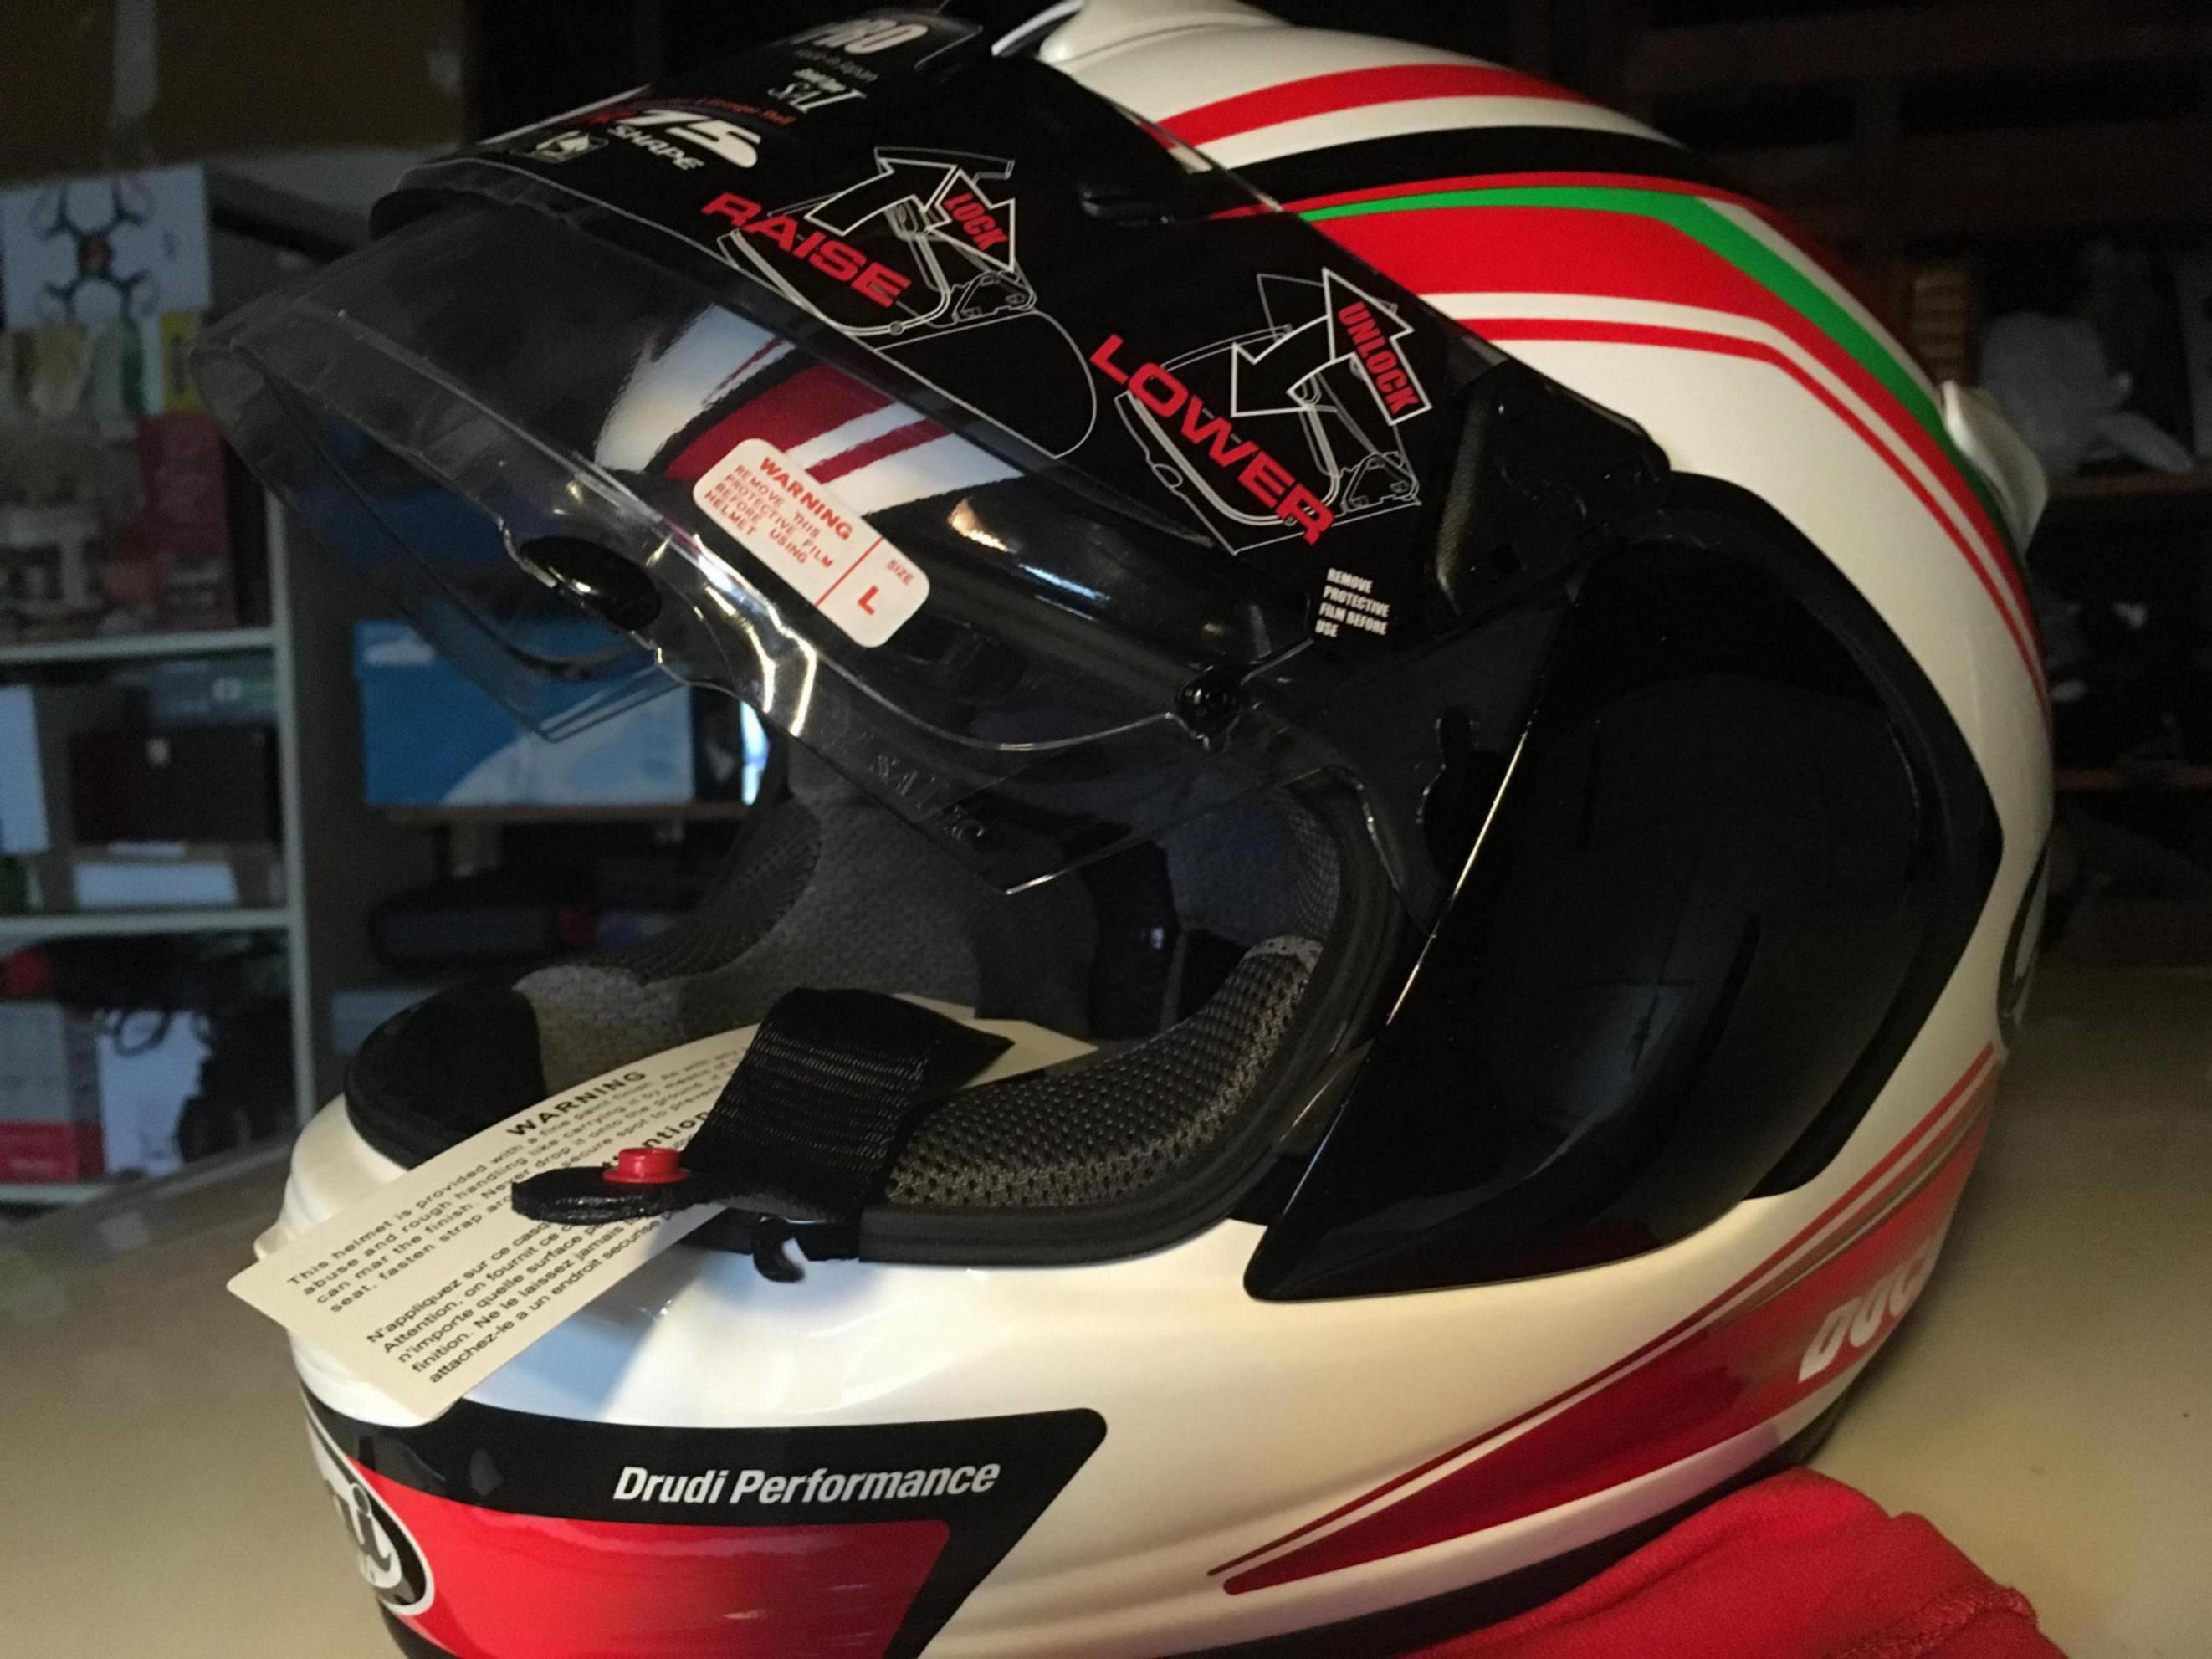 Arai Ducati SBK 2 corse large-img_2652_1528551159076.jpg